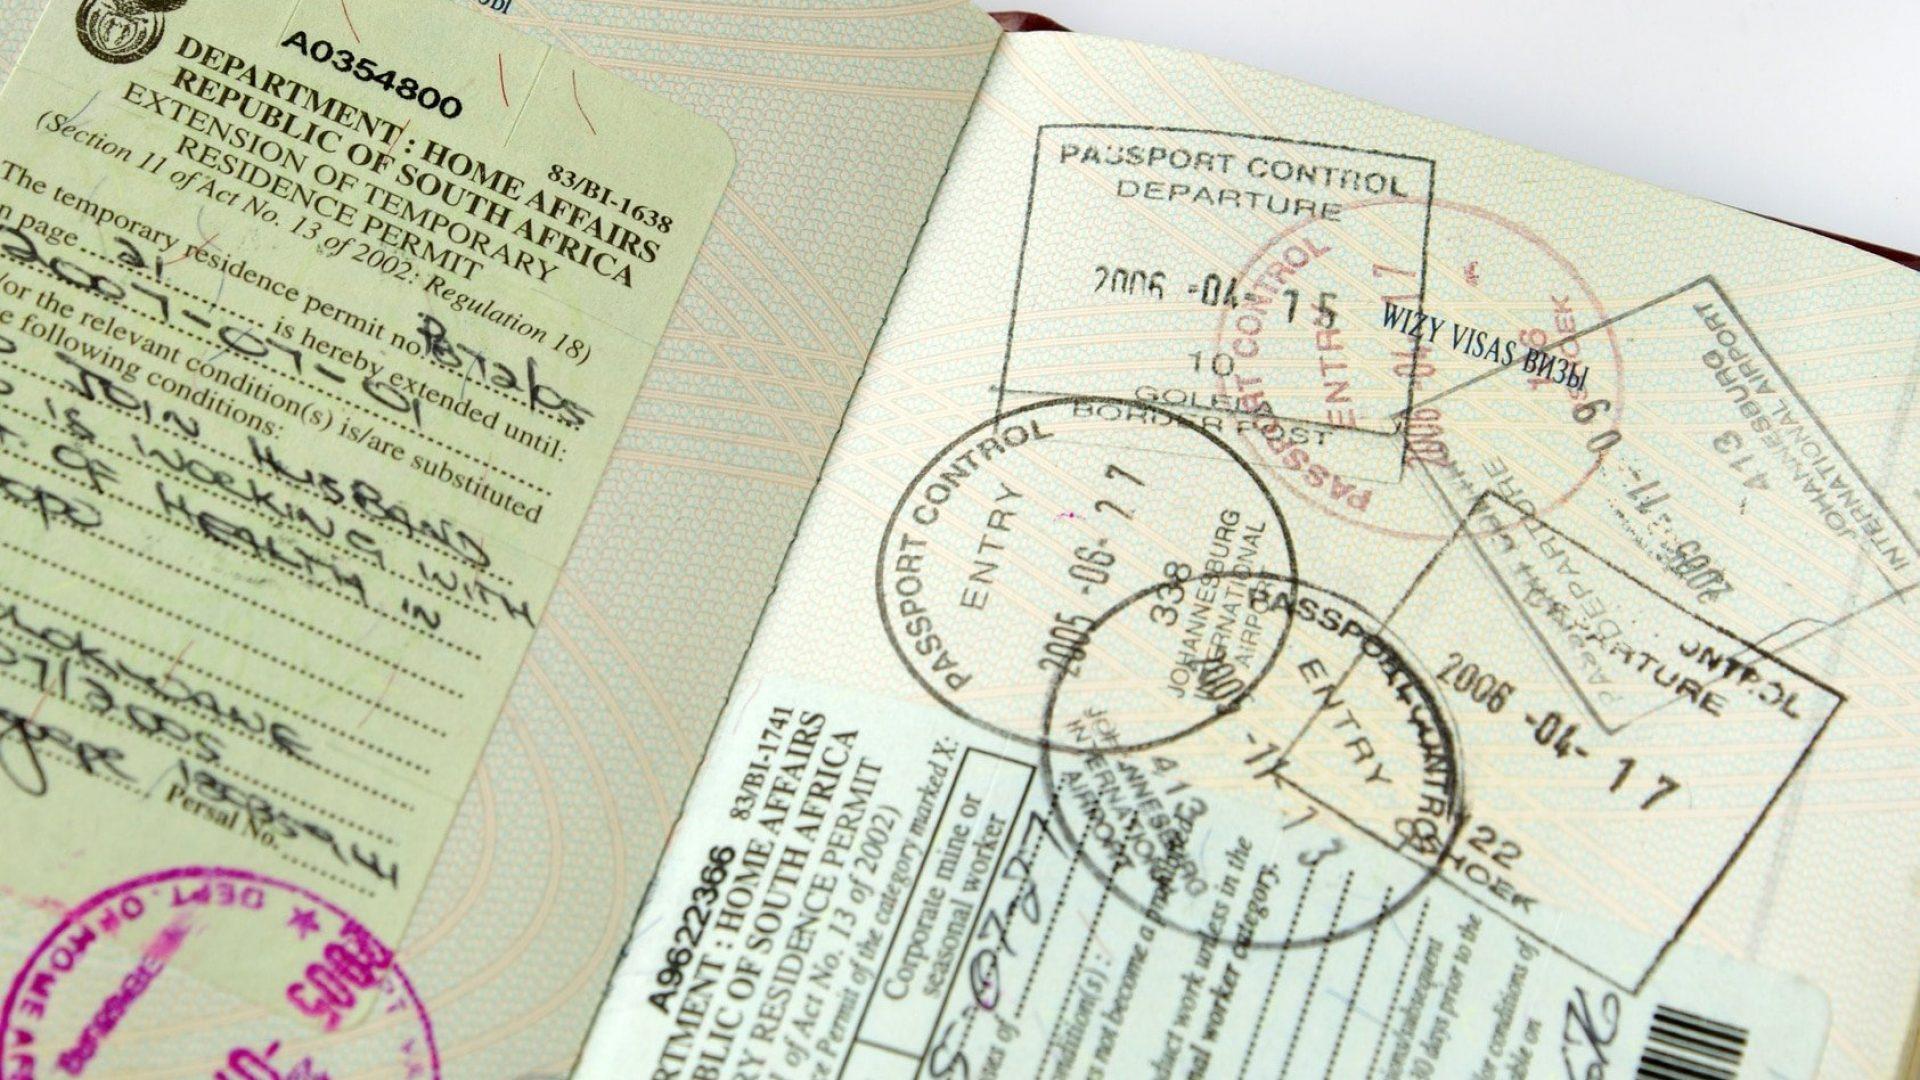 south africa tourist visa